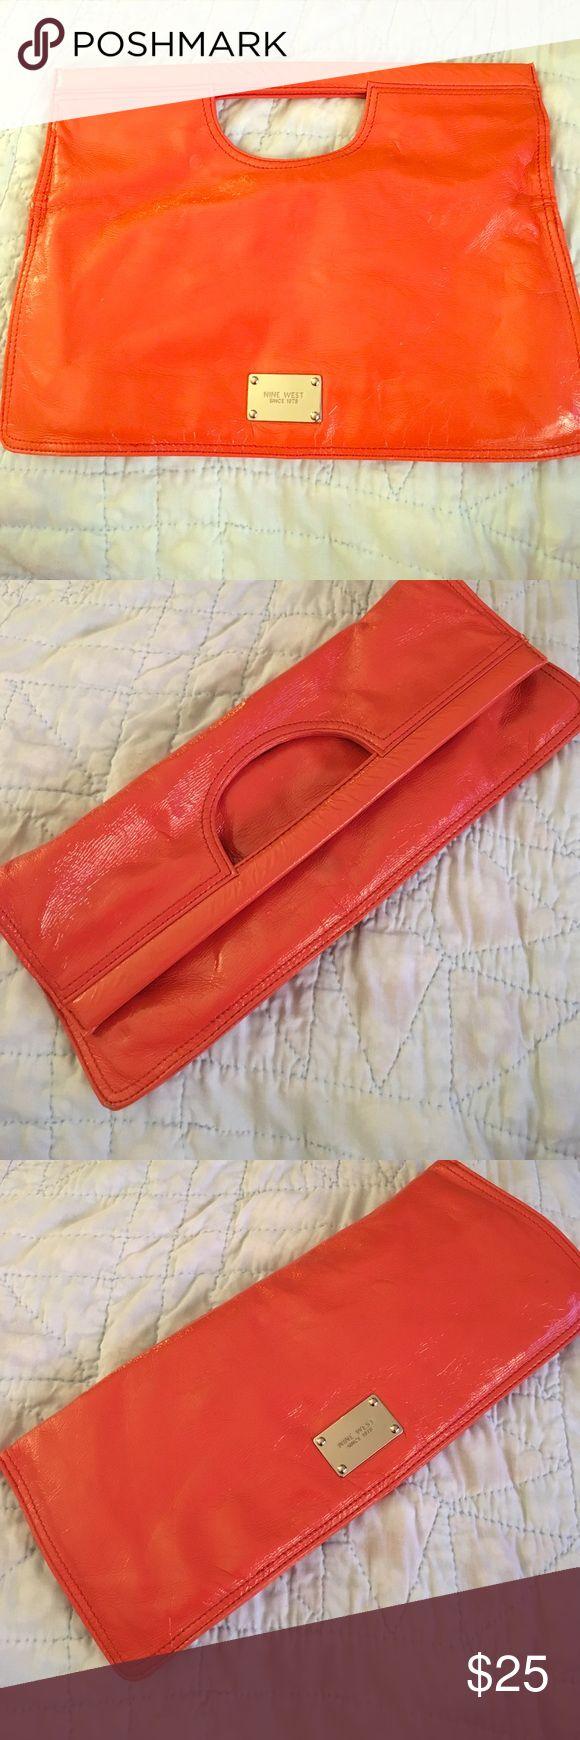 Orange foldover clutch! Nine West orange foldover clutch patent finish Nine West Bags Clutches & Wristlets